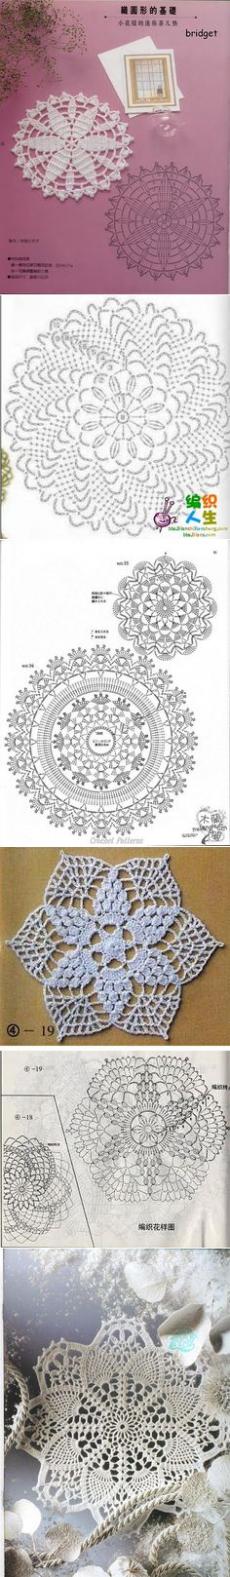 (68) Crochet doilies | Crochet: Doilies, Tablerunners and Tablecloths | Connectedness Hook Napkins, Doilies and crochet stand under the cup